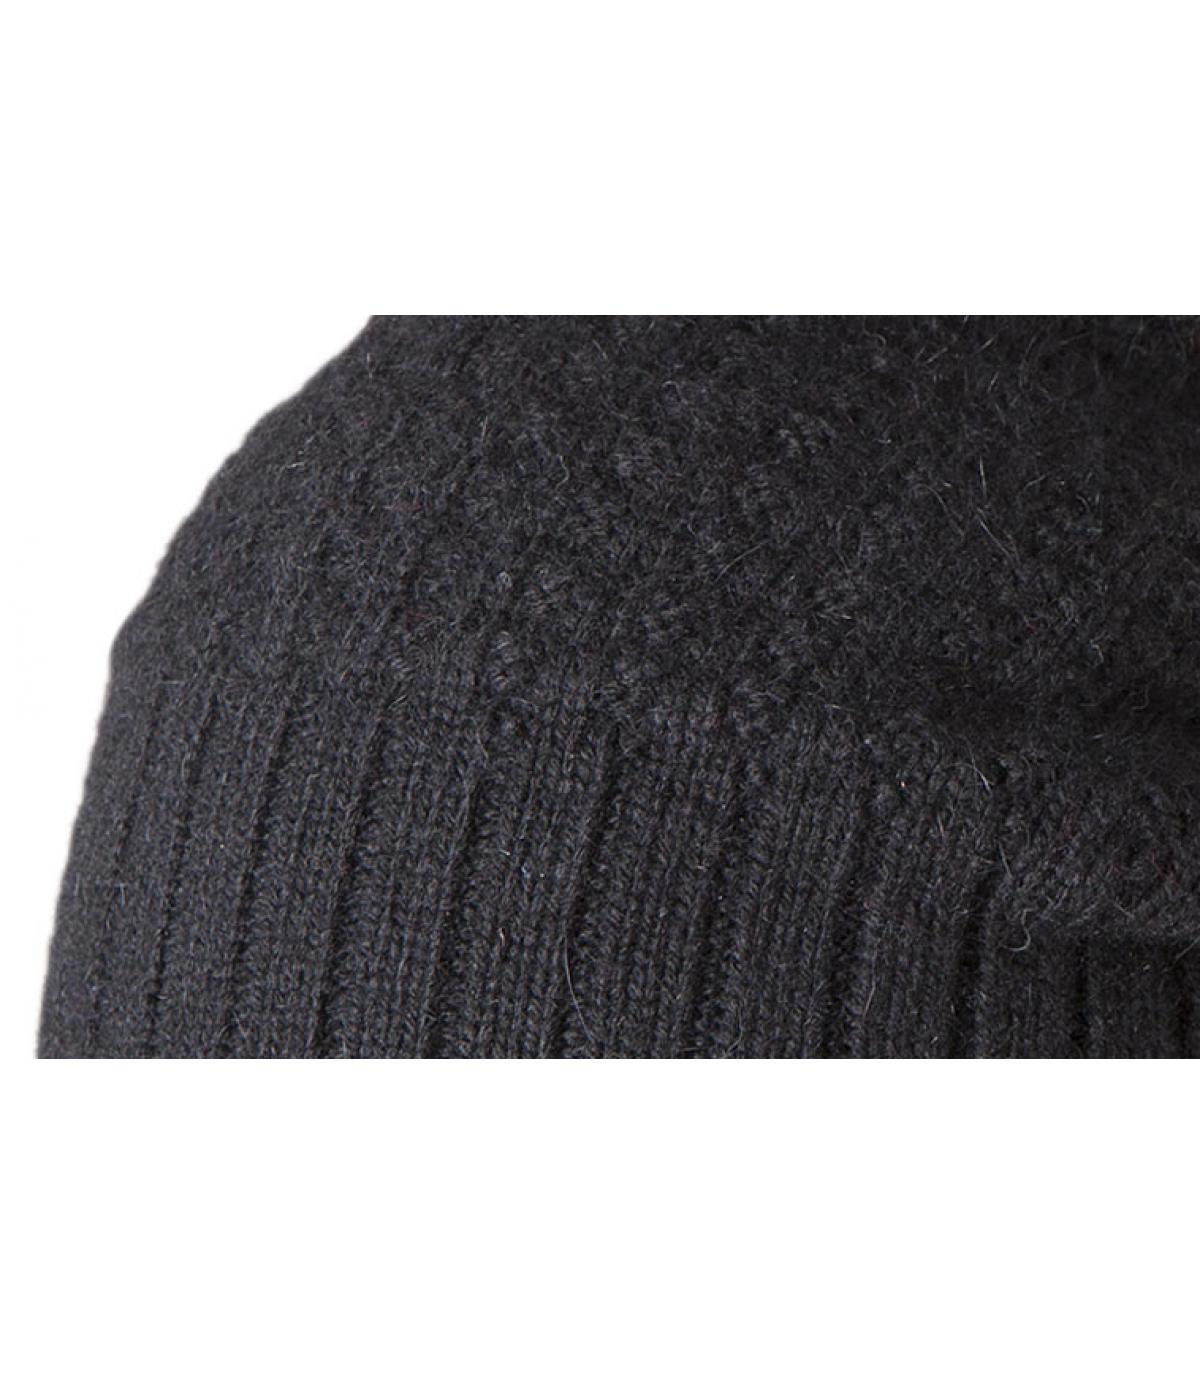 Details Schwarze Mütze Hudson  - Abbildung 2